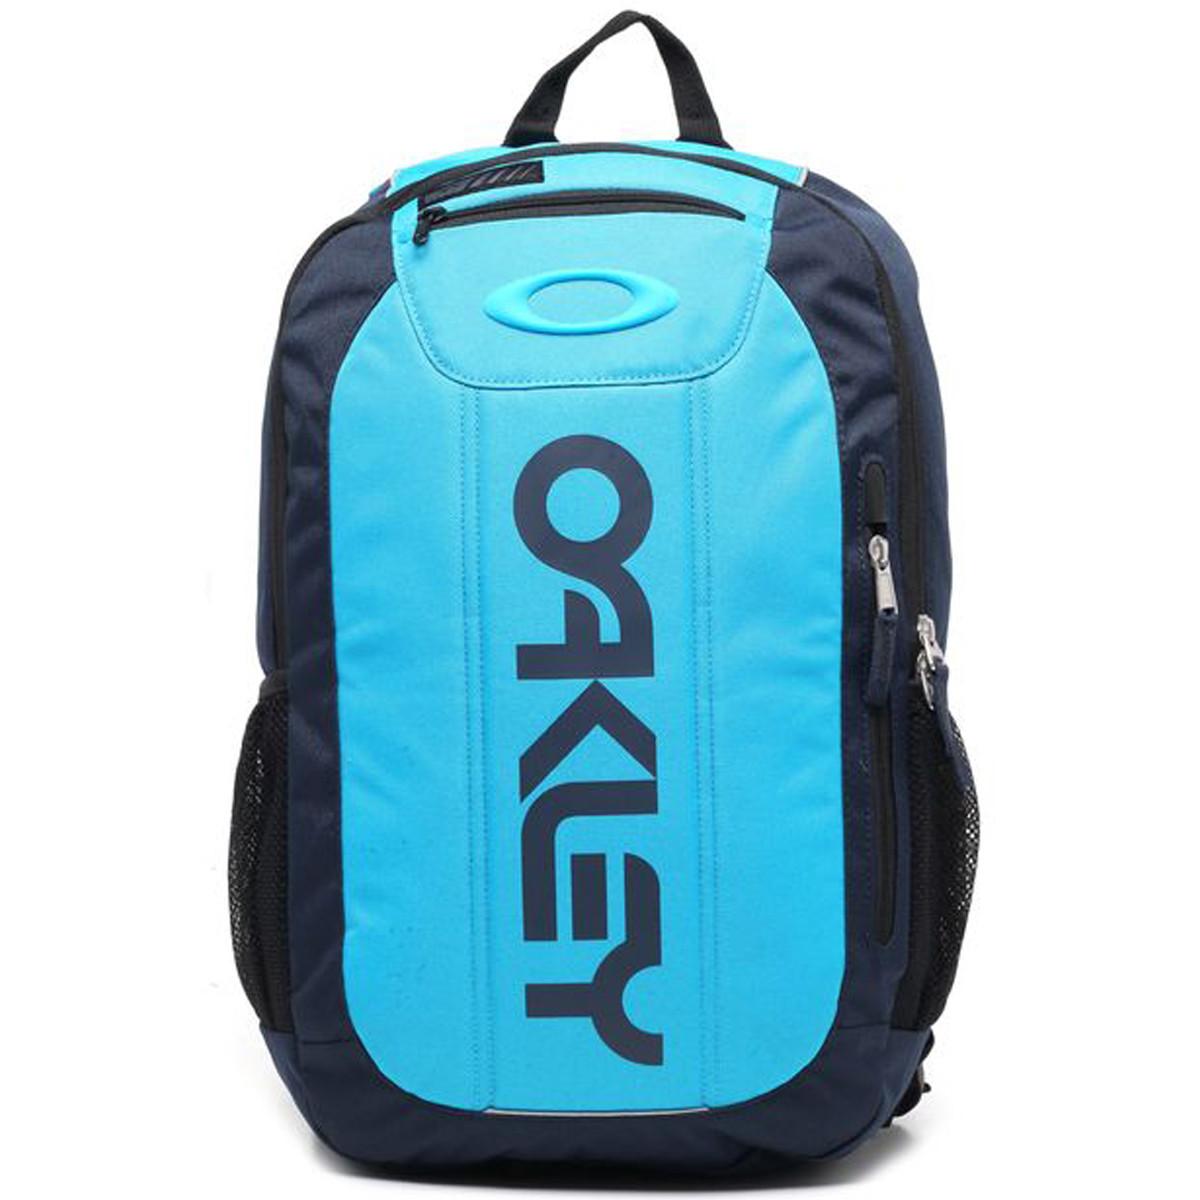 Mochila Oakley Enduro Azul 20L ref  92963-6B2 3f53ece56f